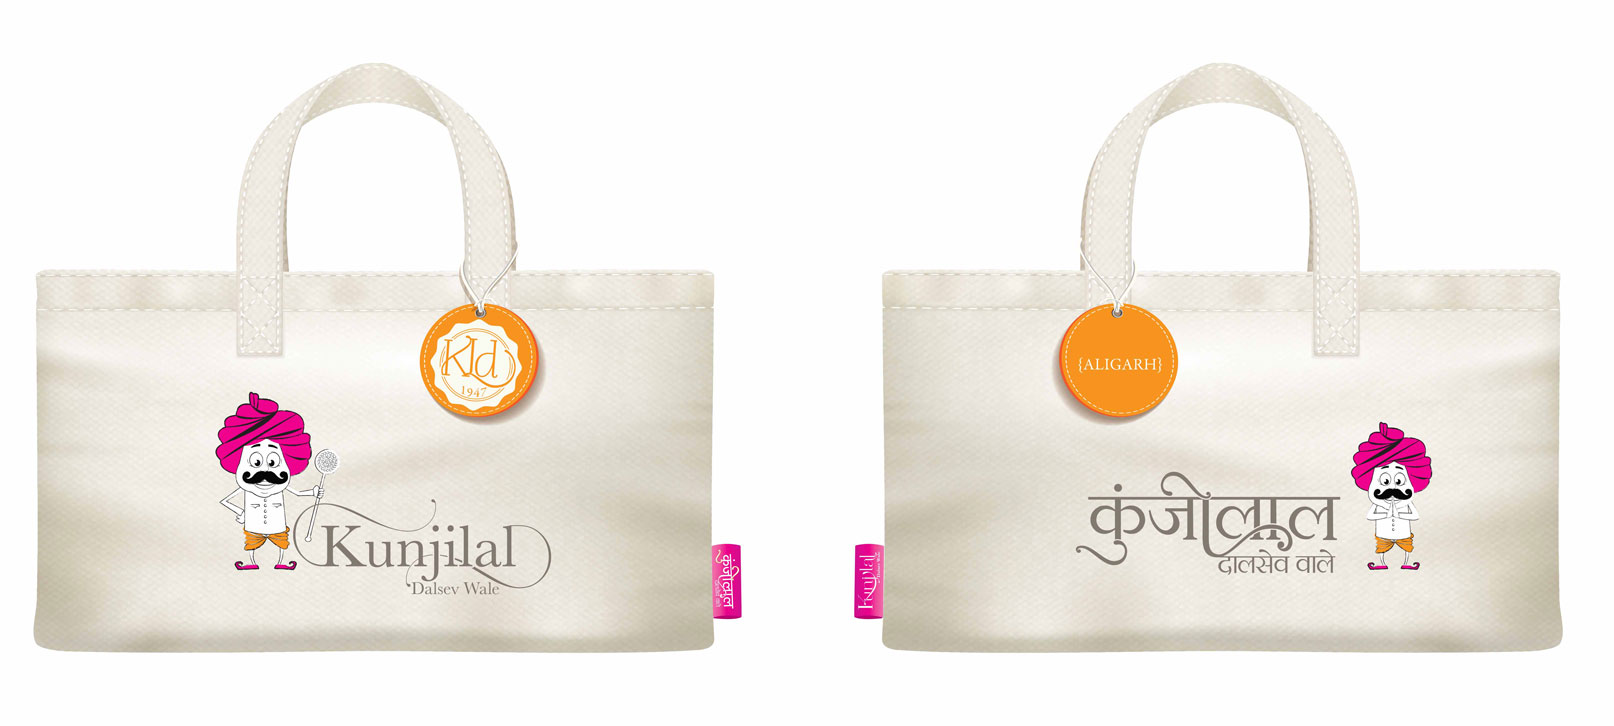 Shopping Bags - kunjilal